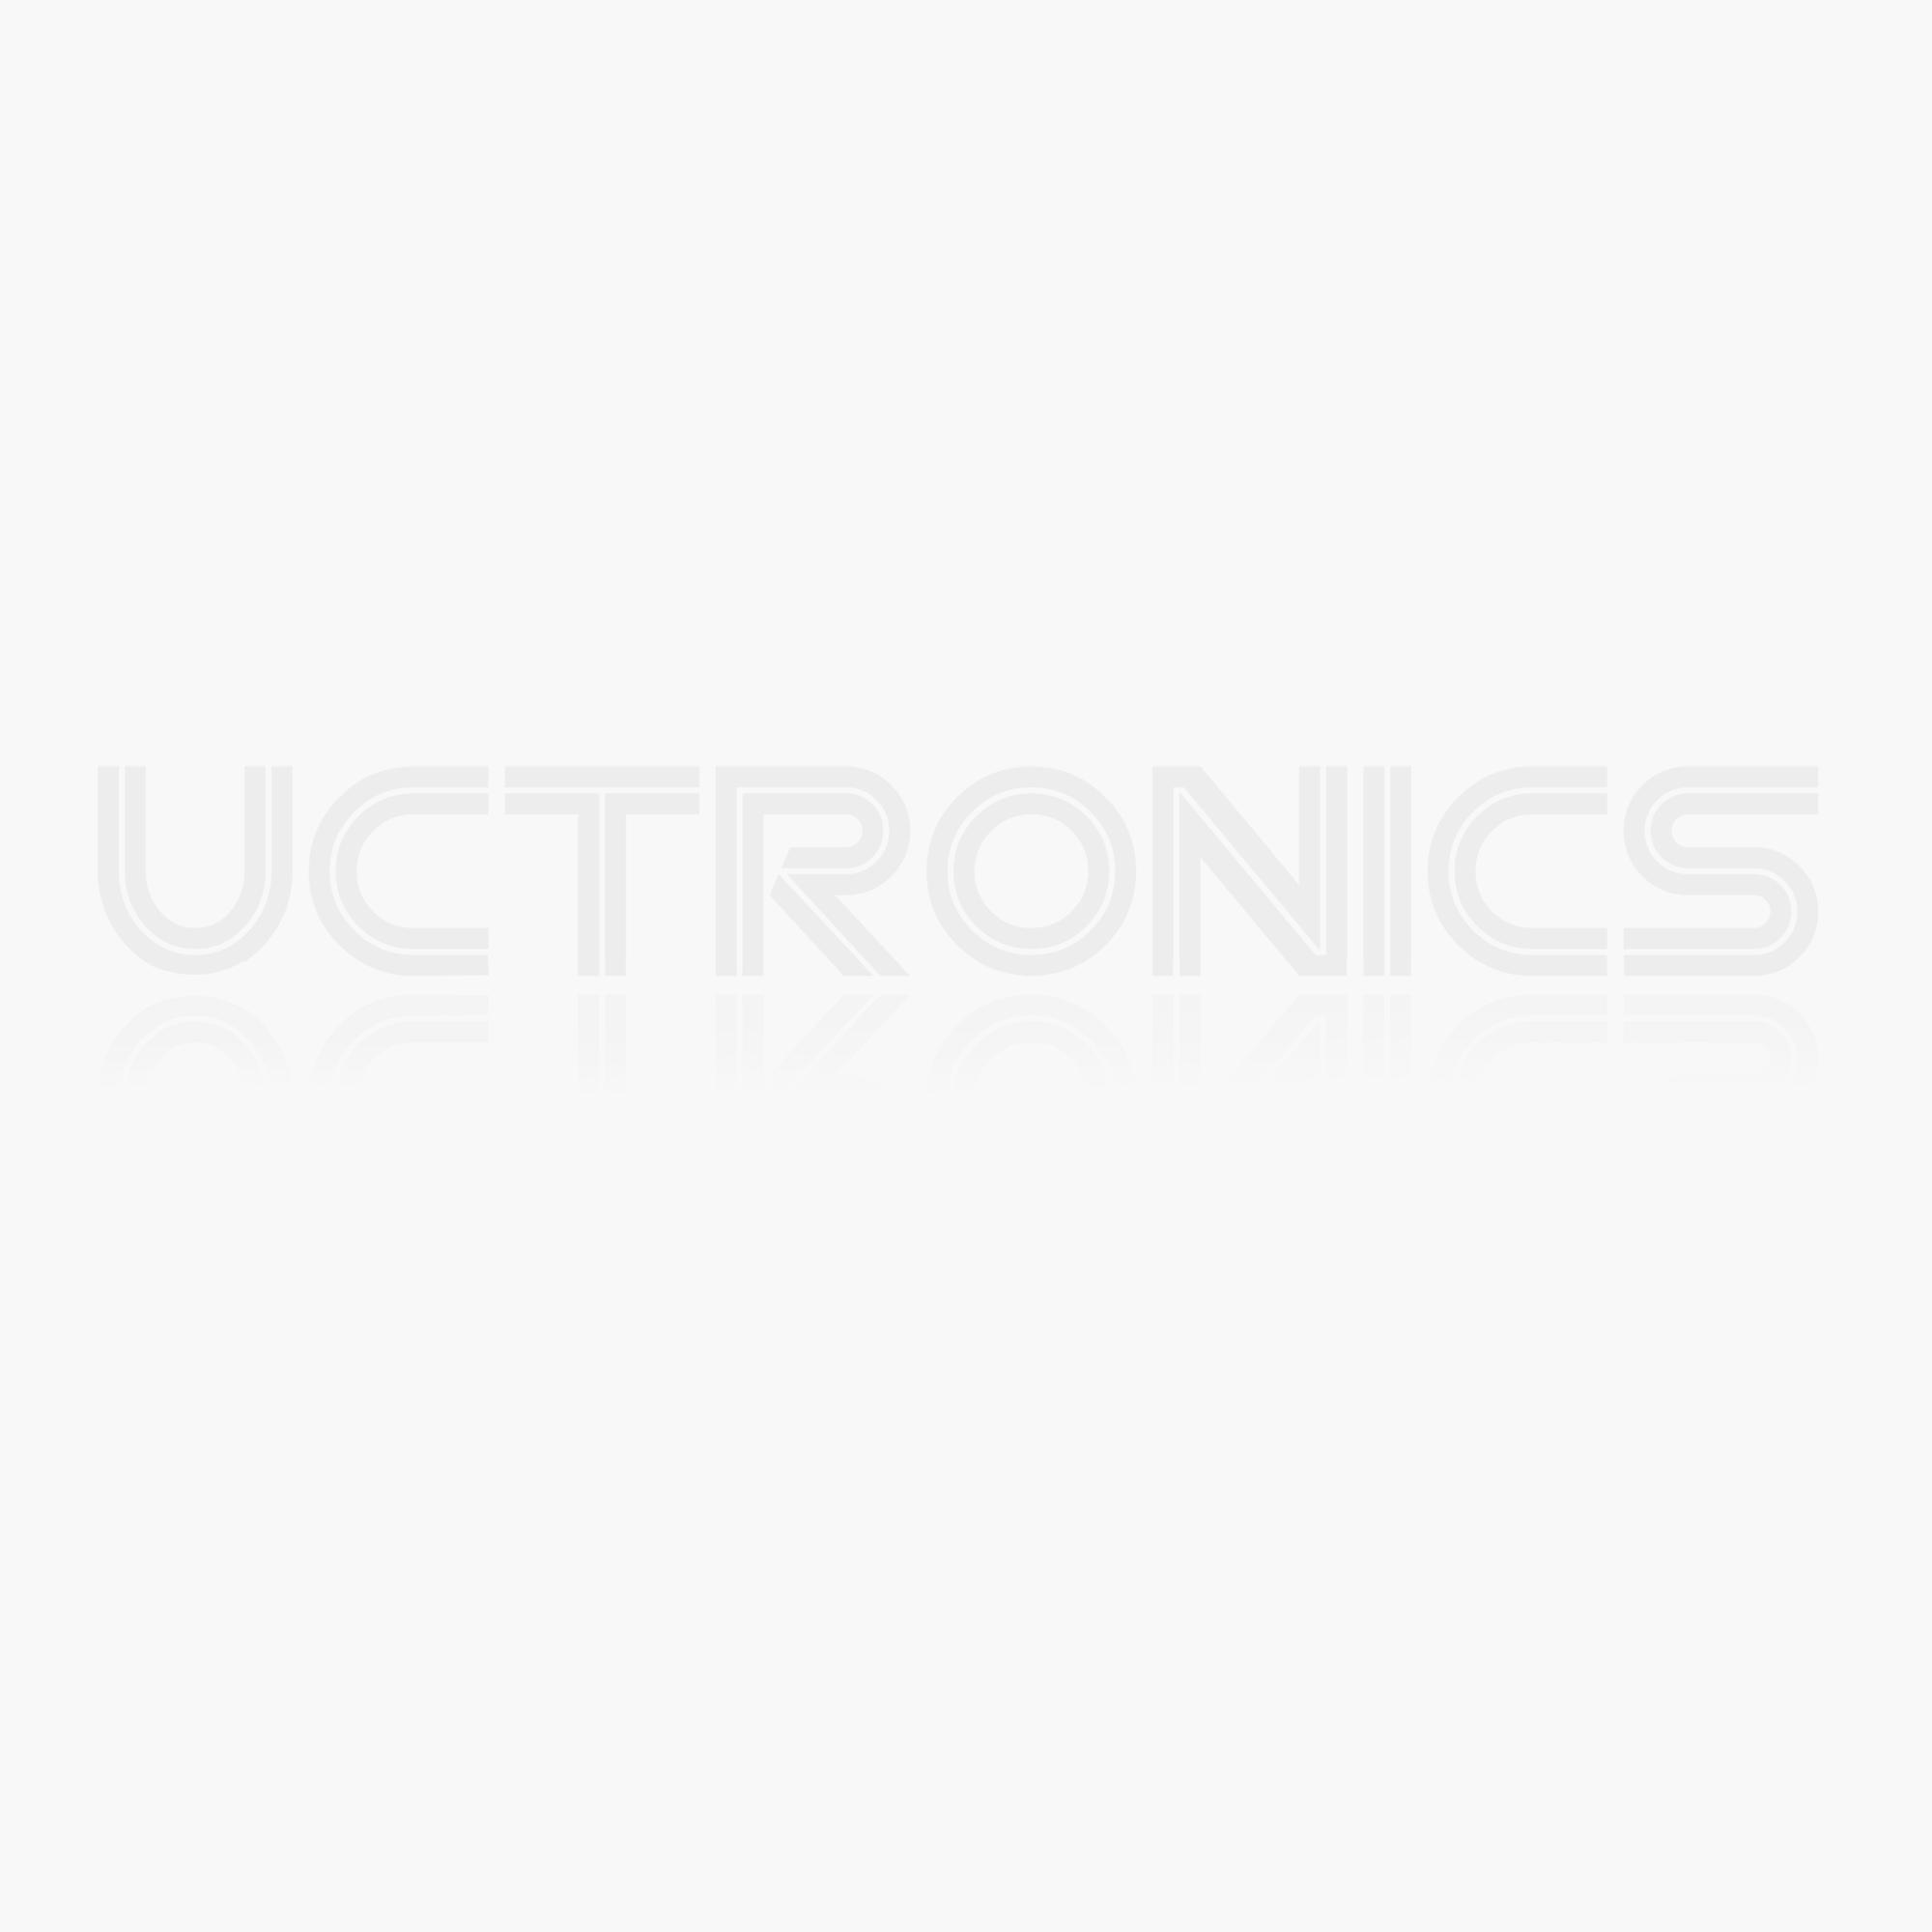 DC-DC 0.8V-5V to 5V 200mA Step up Power Supply Conversion Module